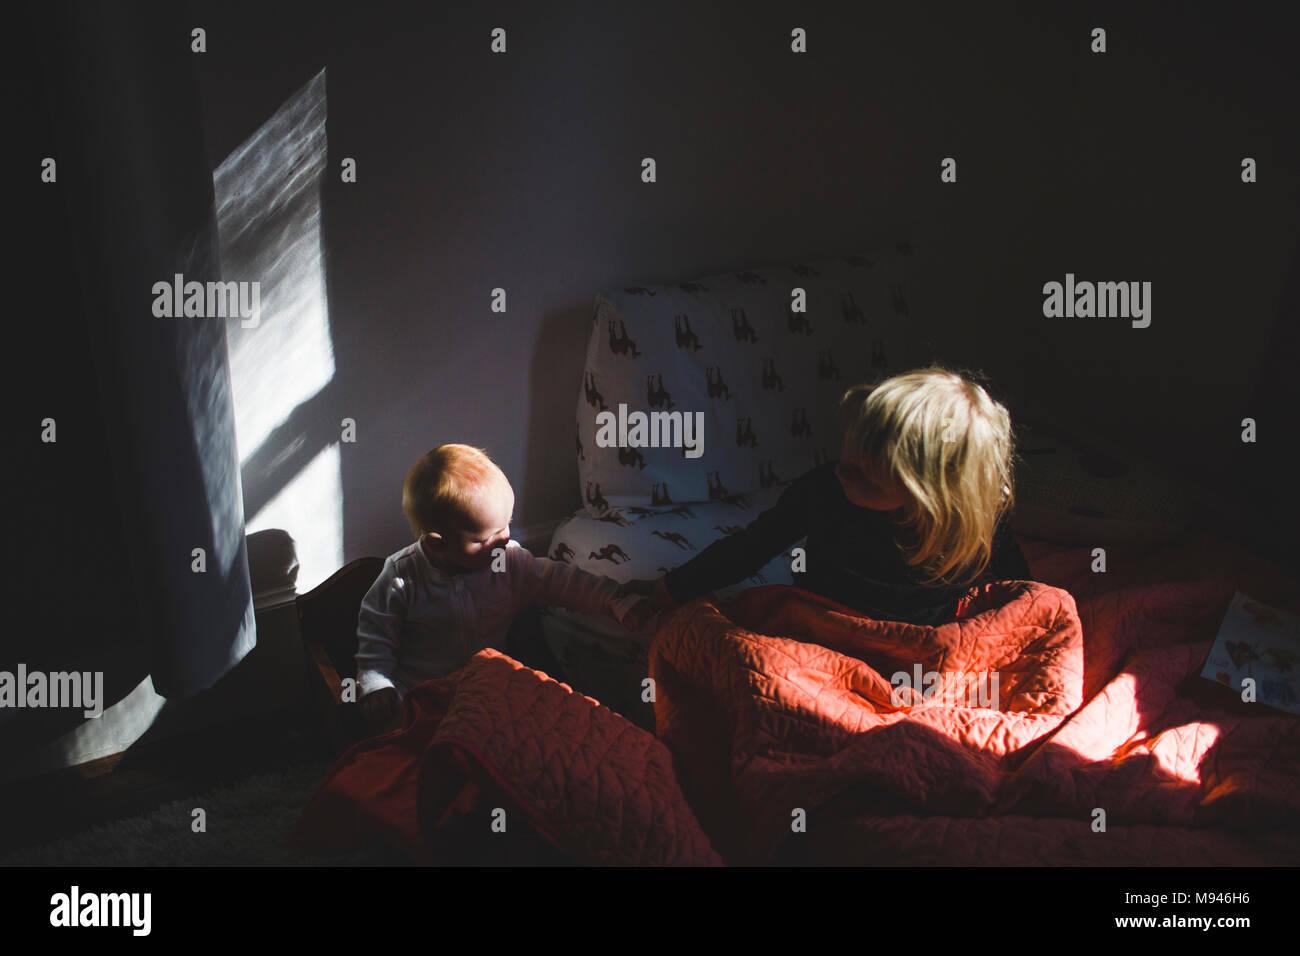 Niña y Bebe aguantando mutuamente en camas separadas Imagen De Stock